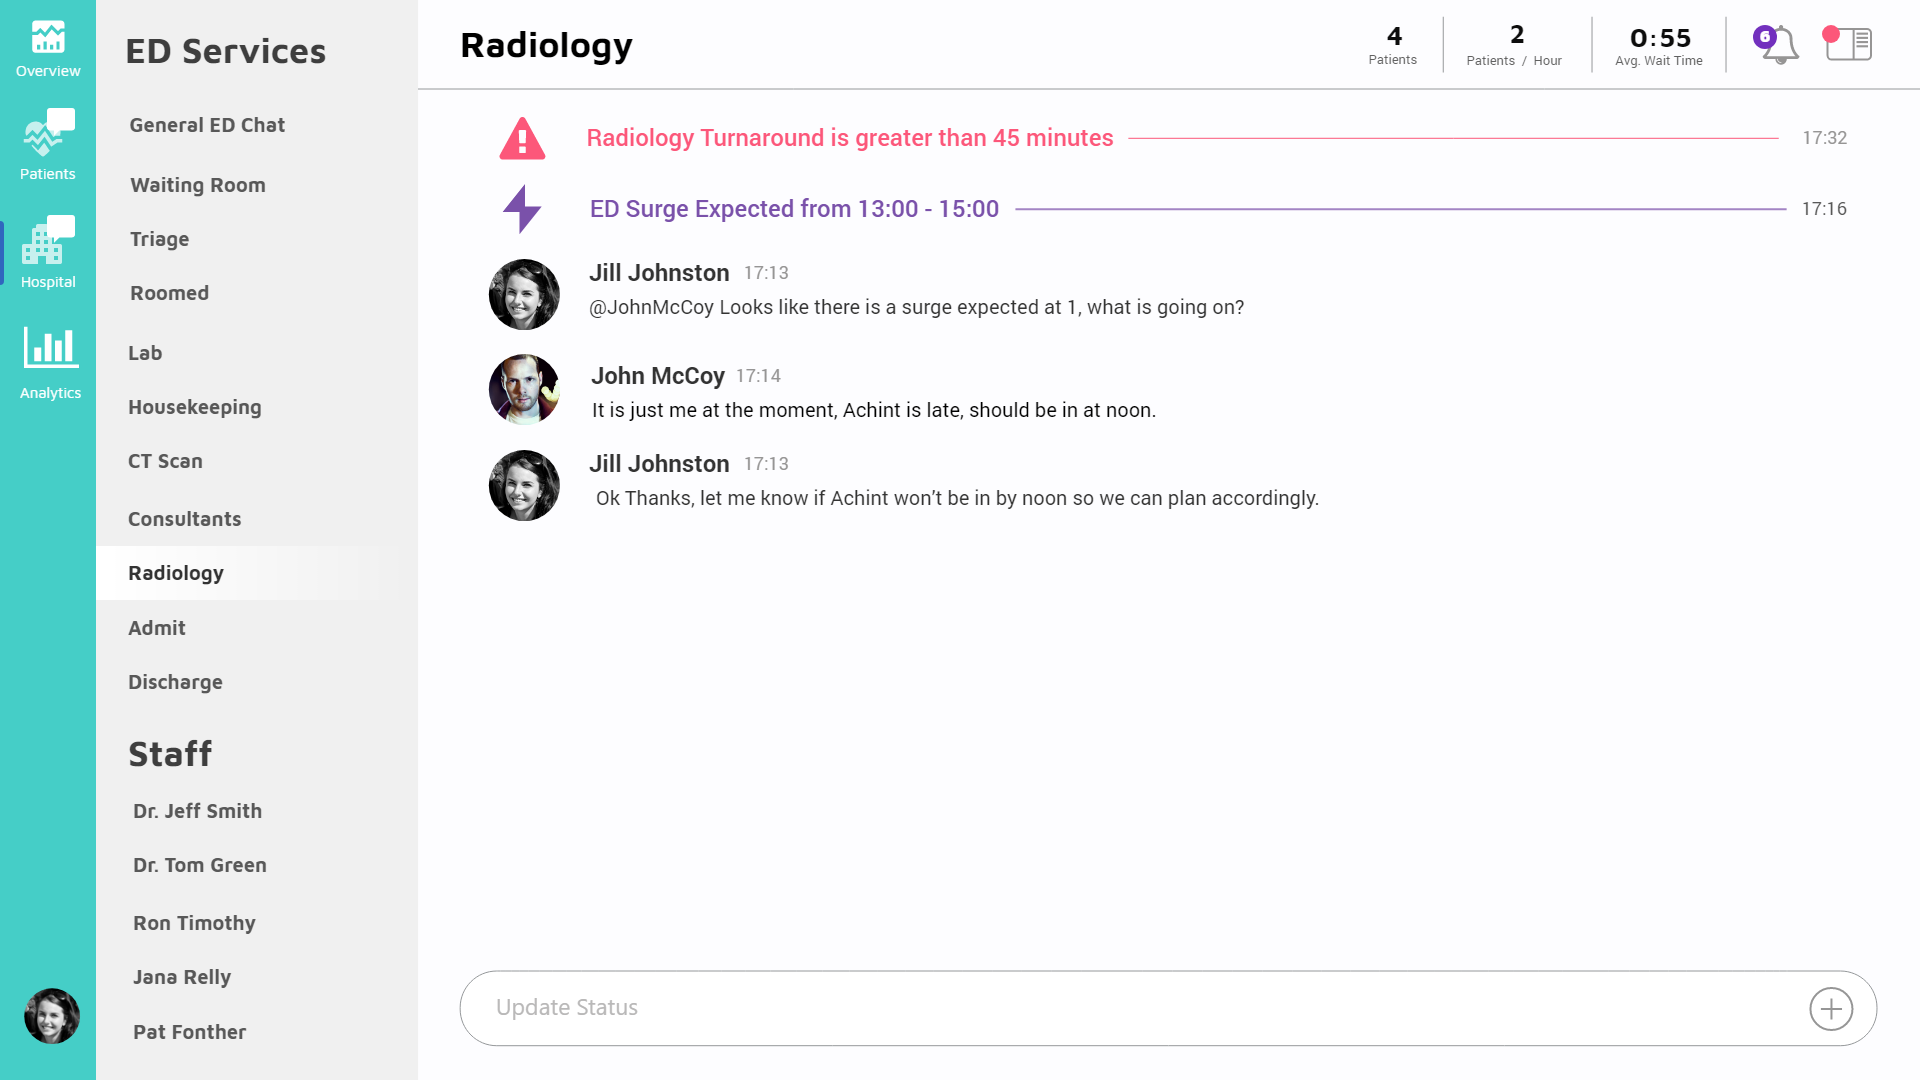 Hospital - Radiology.png